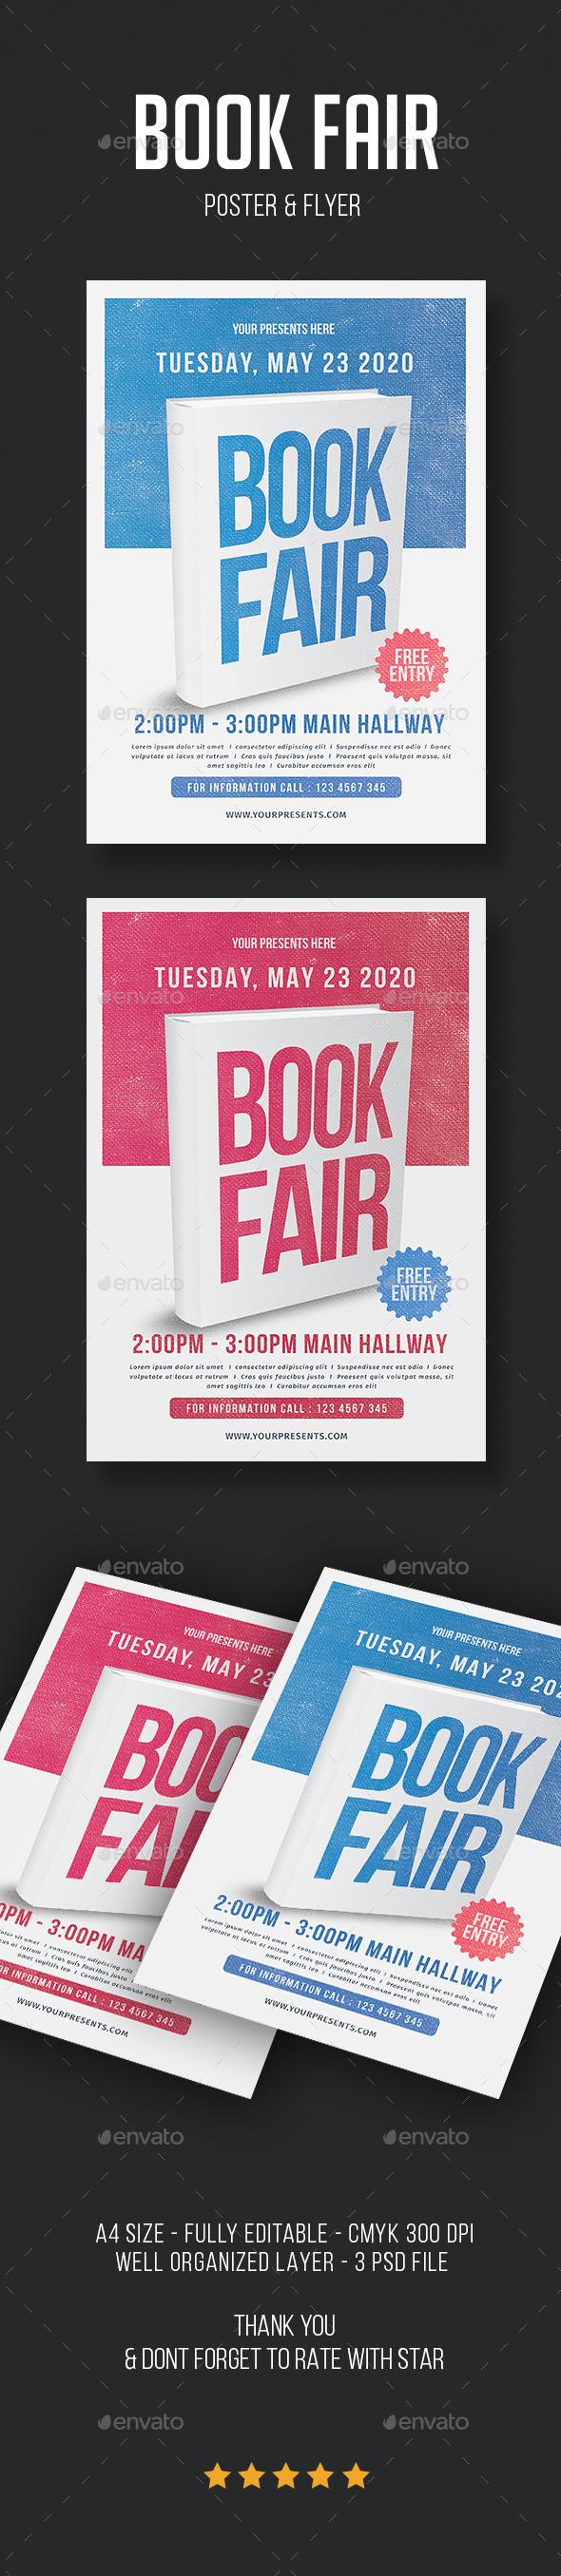 Book Fair Flyer - Flyers Print Templates